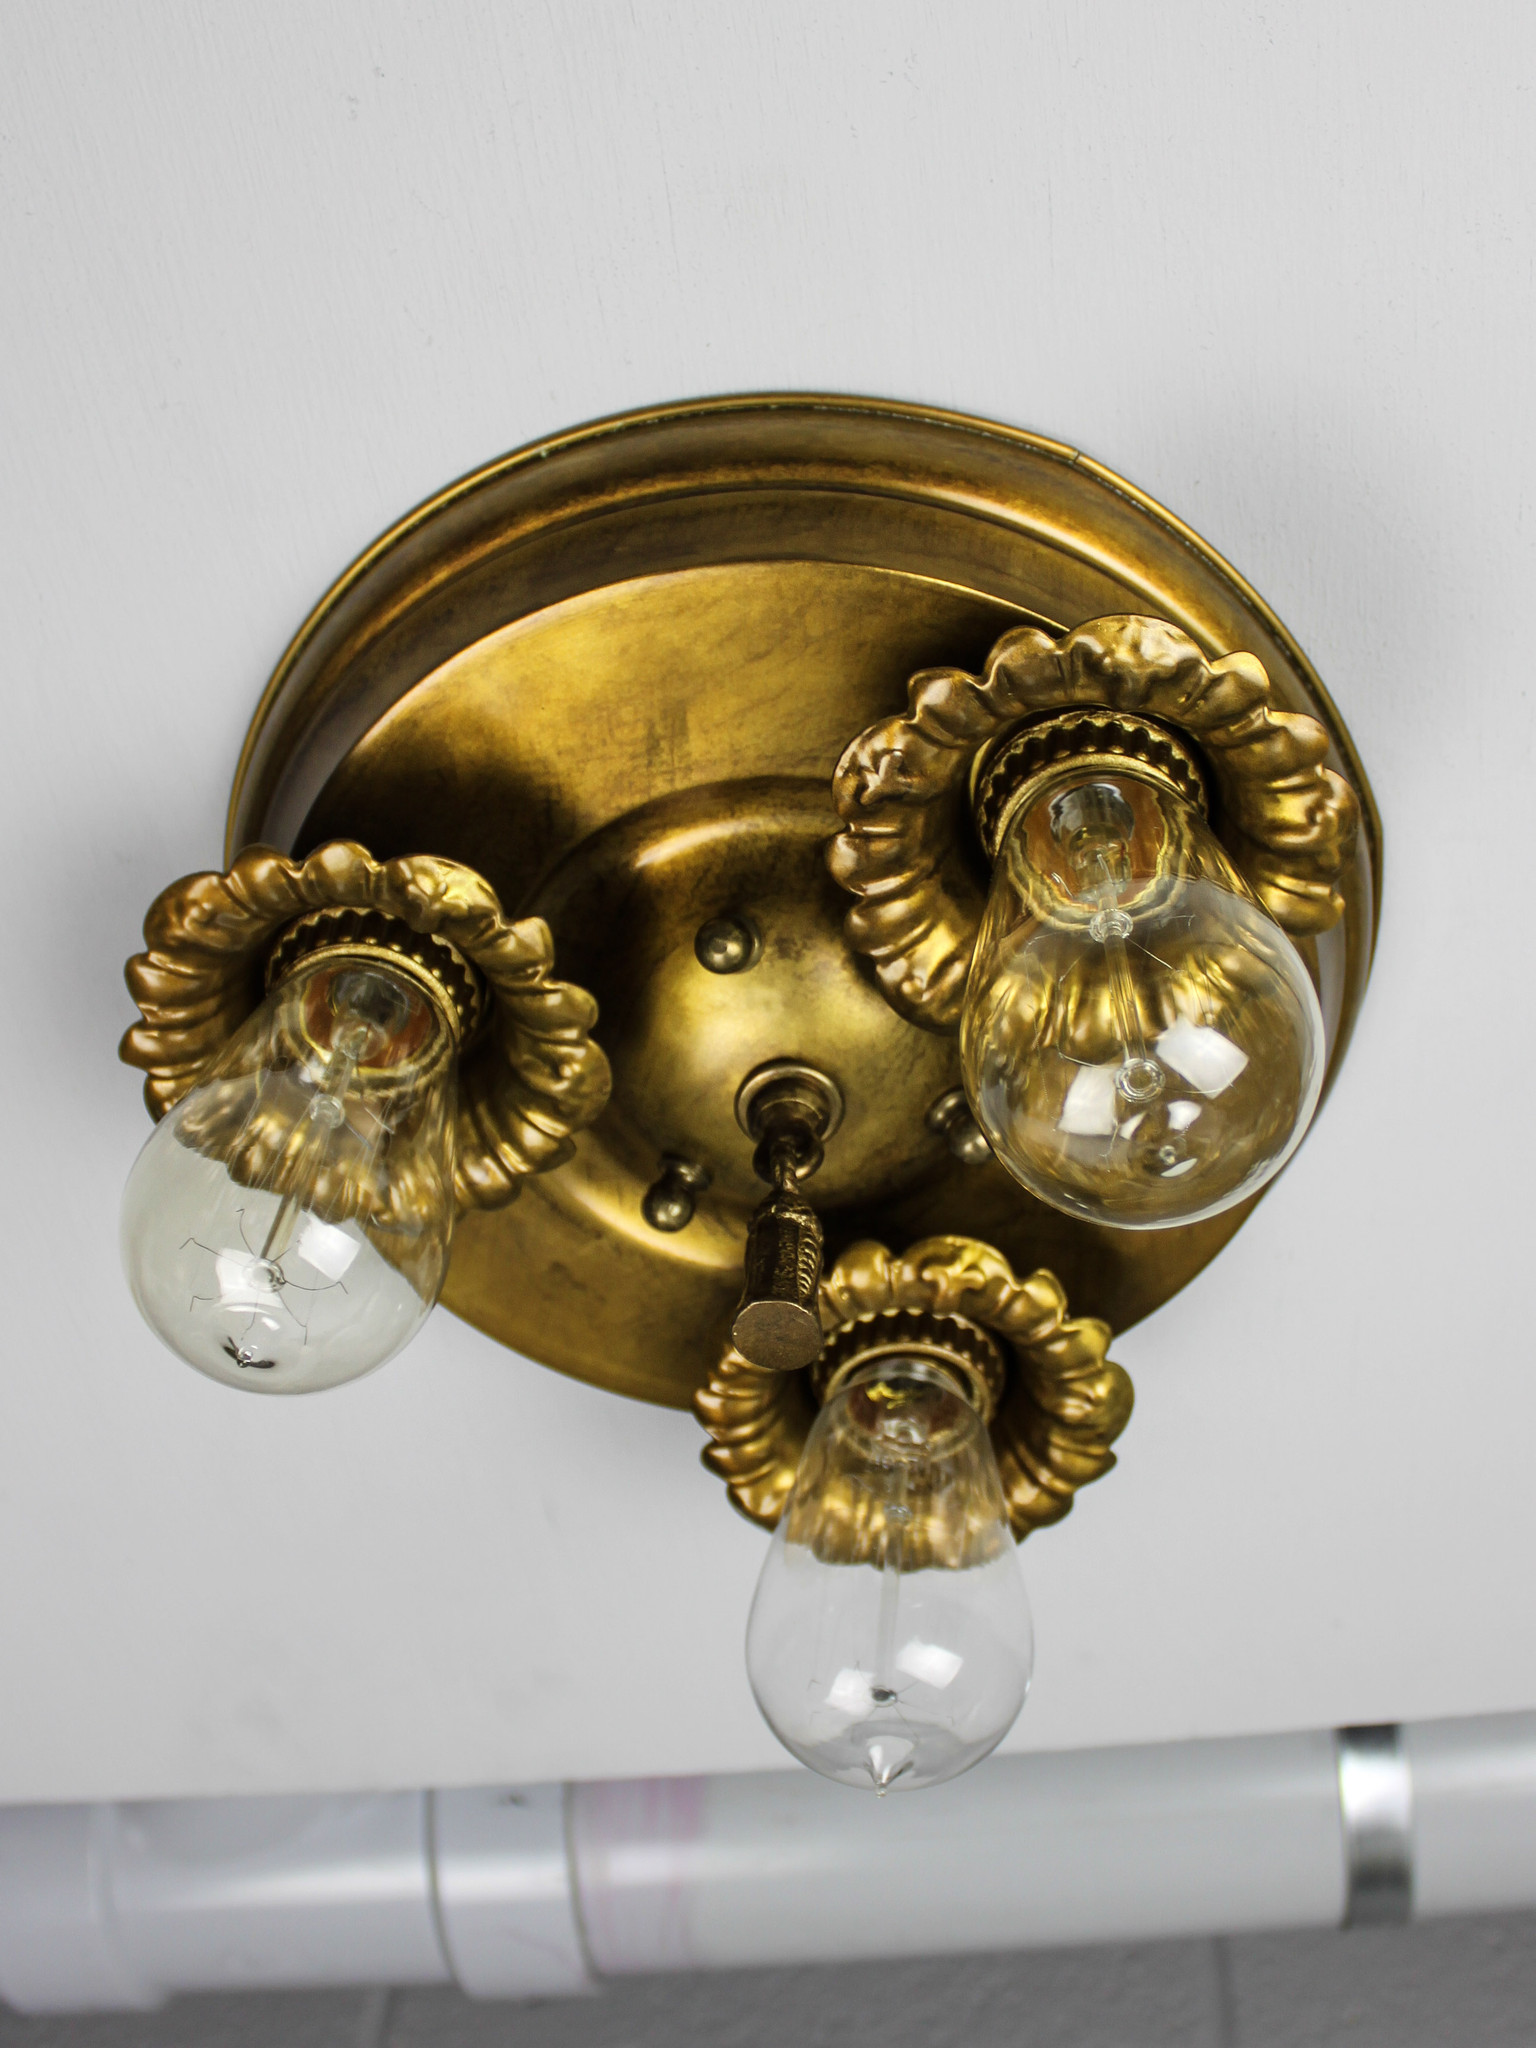 Bare Bulb Flush Mount Light Fixture 3 Light Renew Gallery